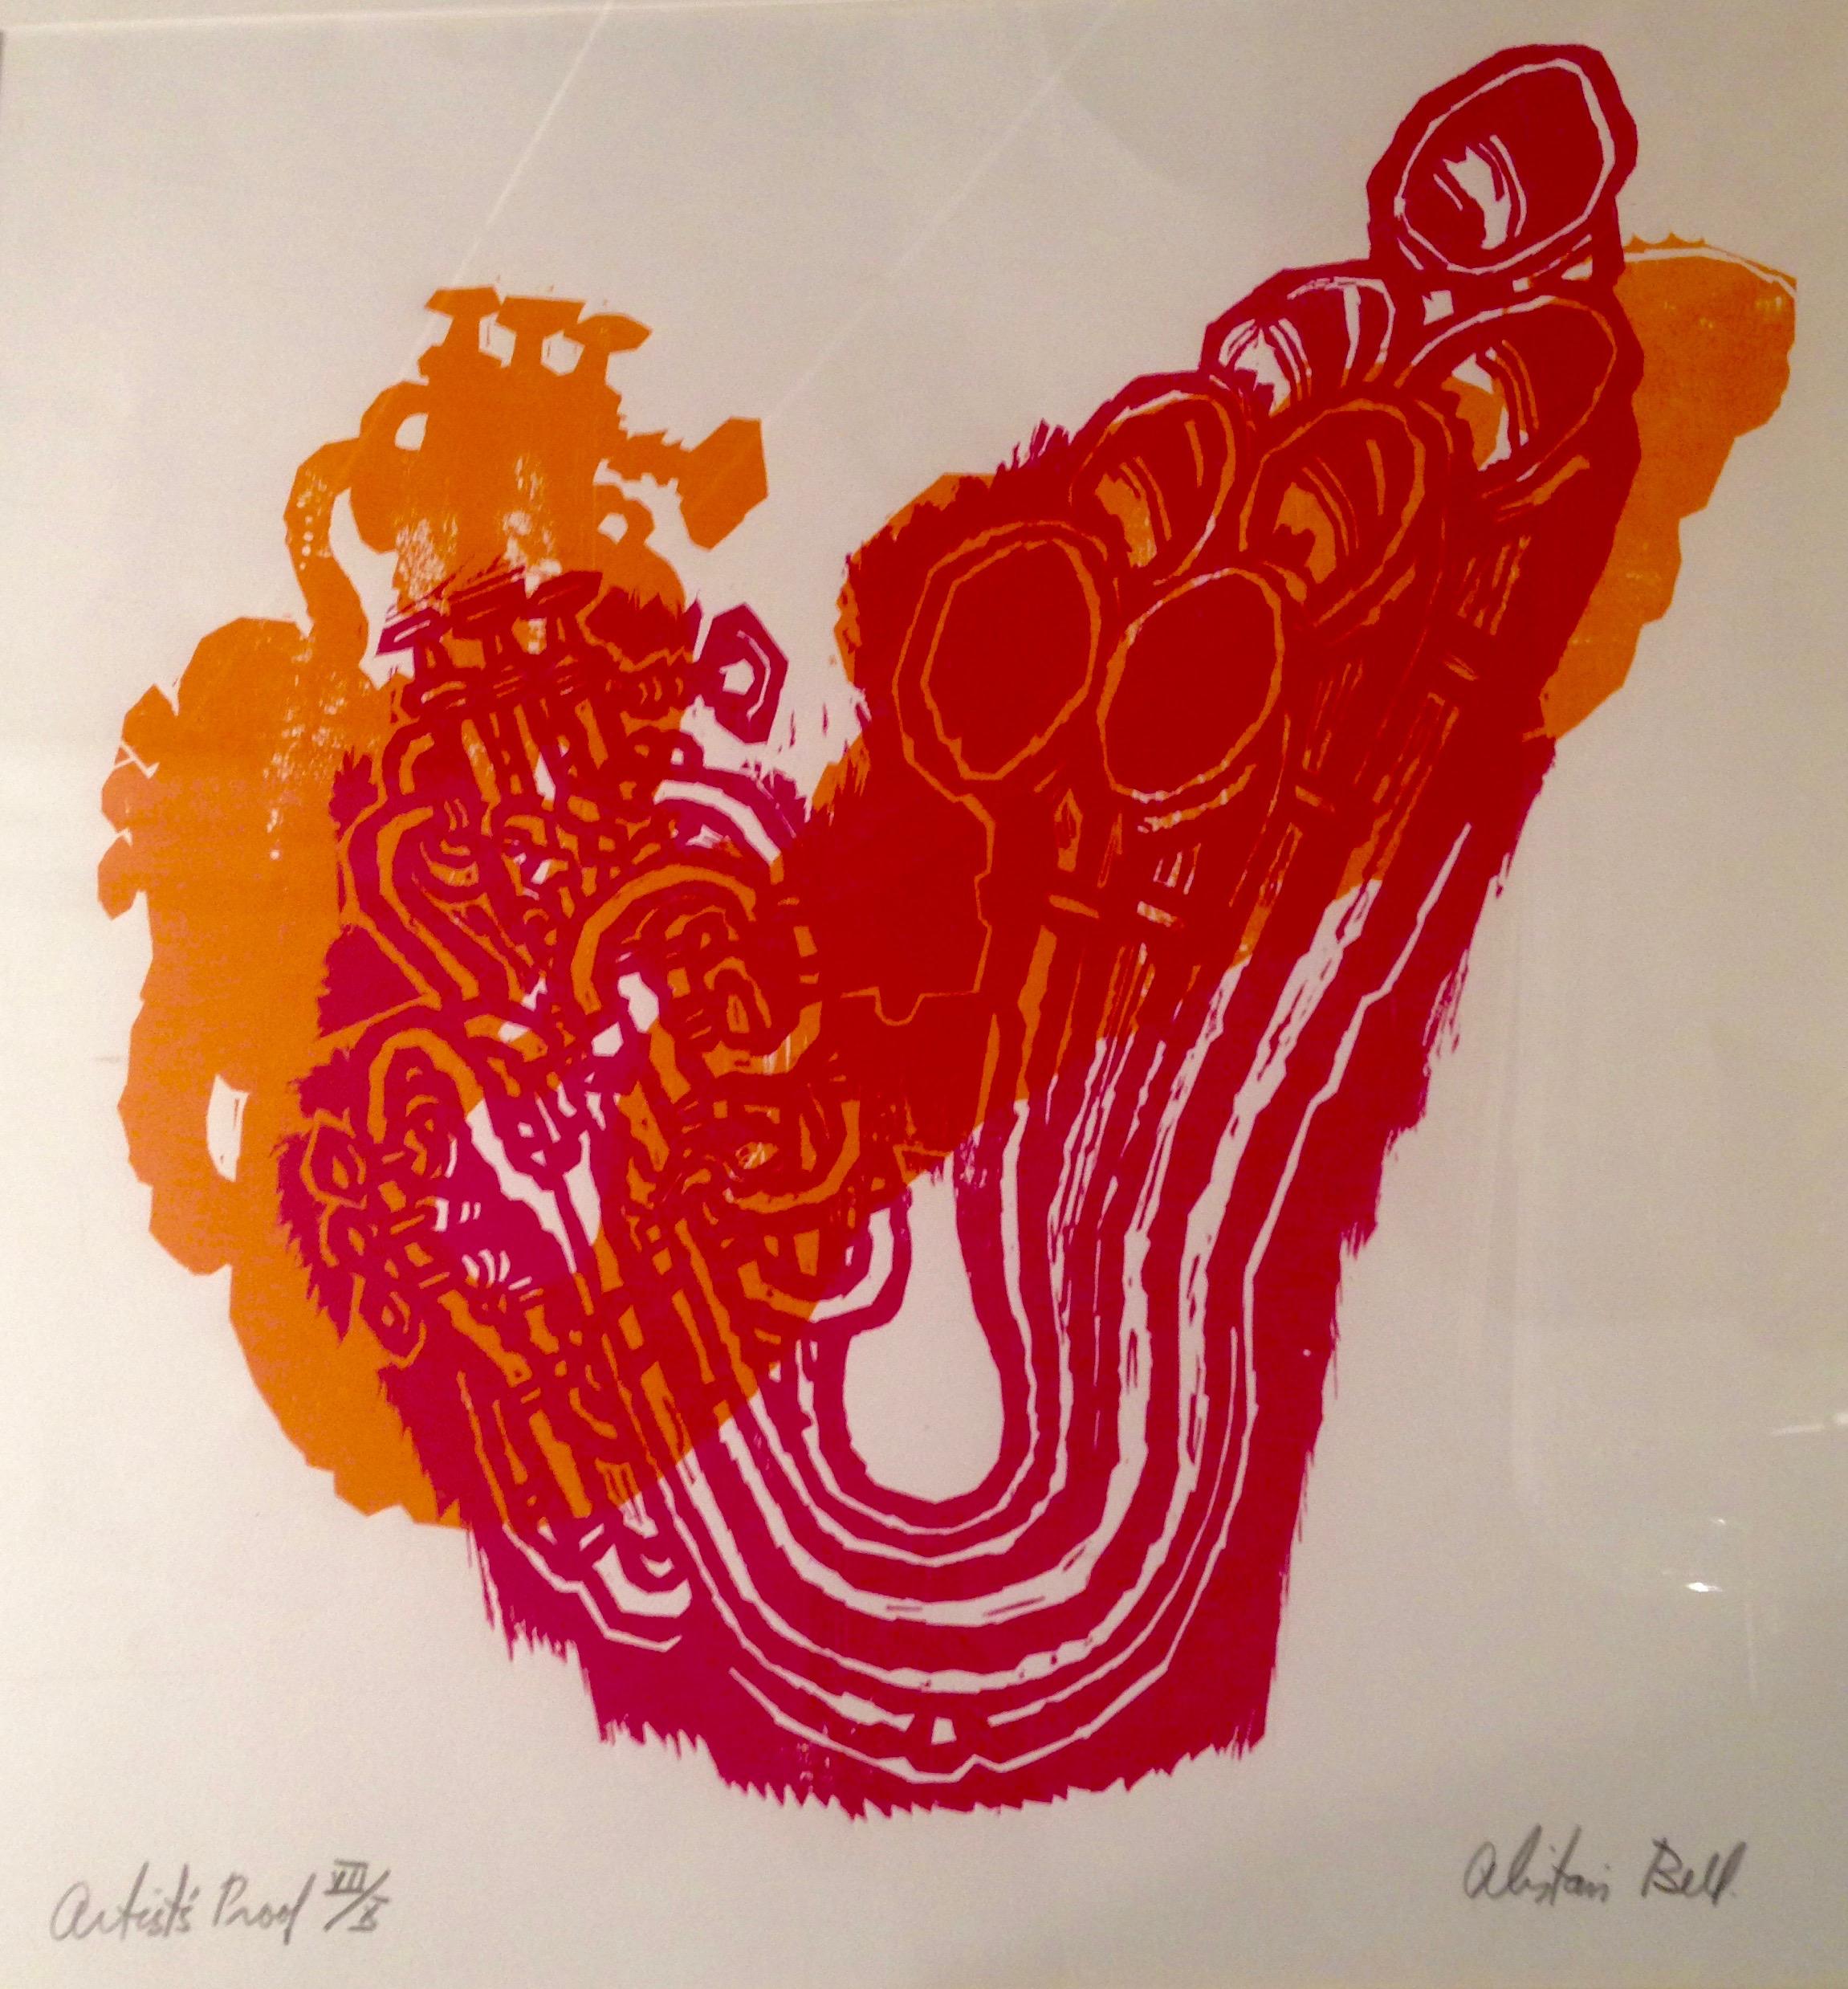 Alistair Macready Bell, The Look of Music, 1980